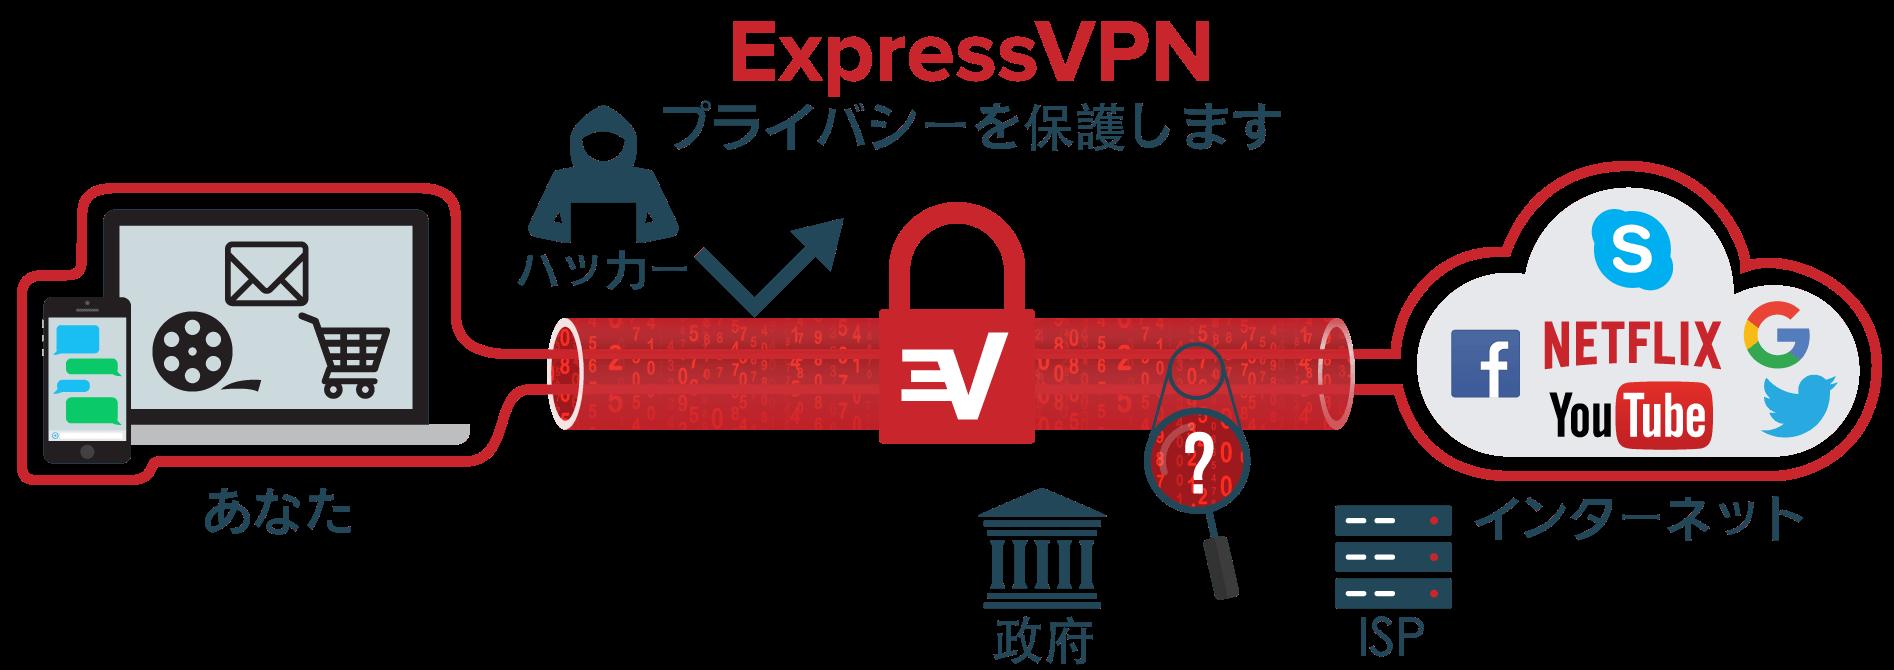 VPNとは?VPNの仕組み(ExpressVPN)